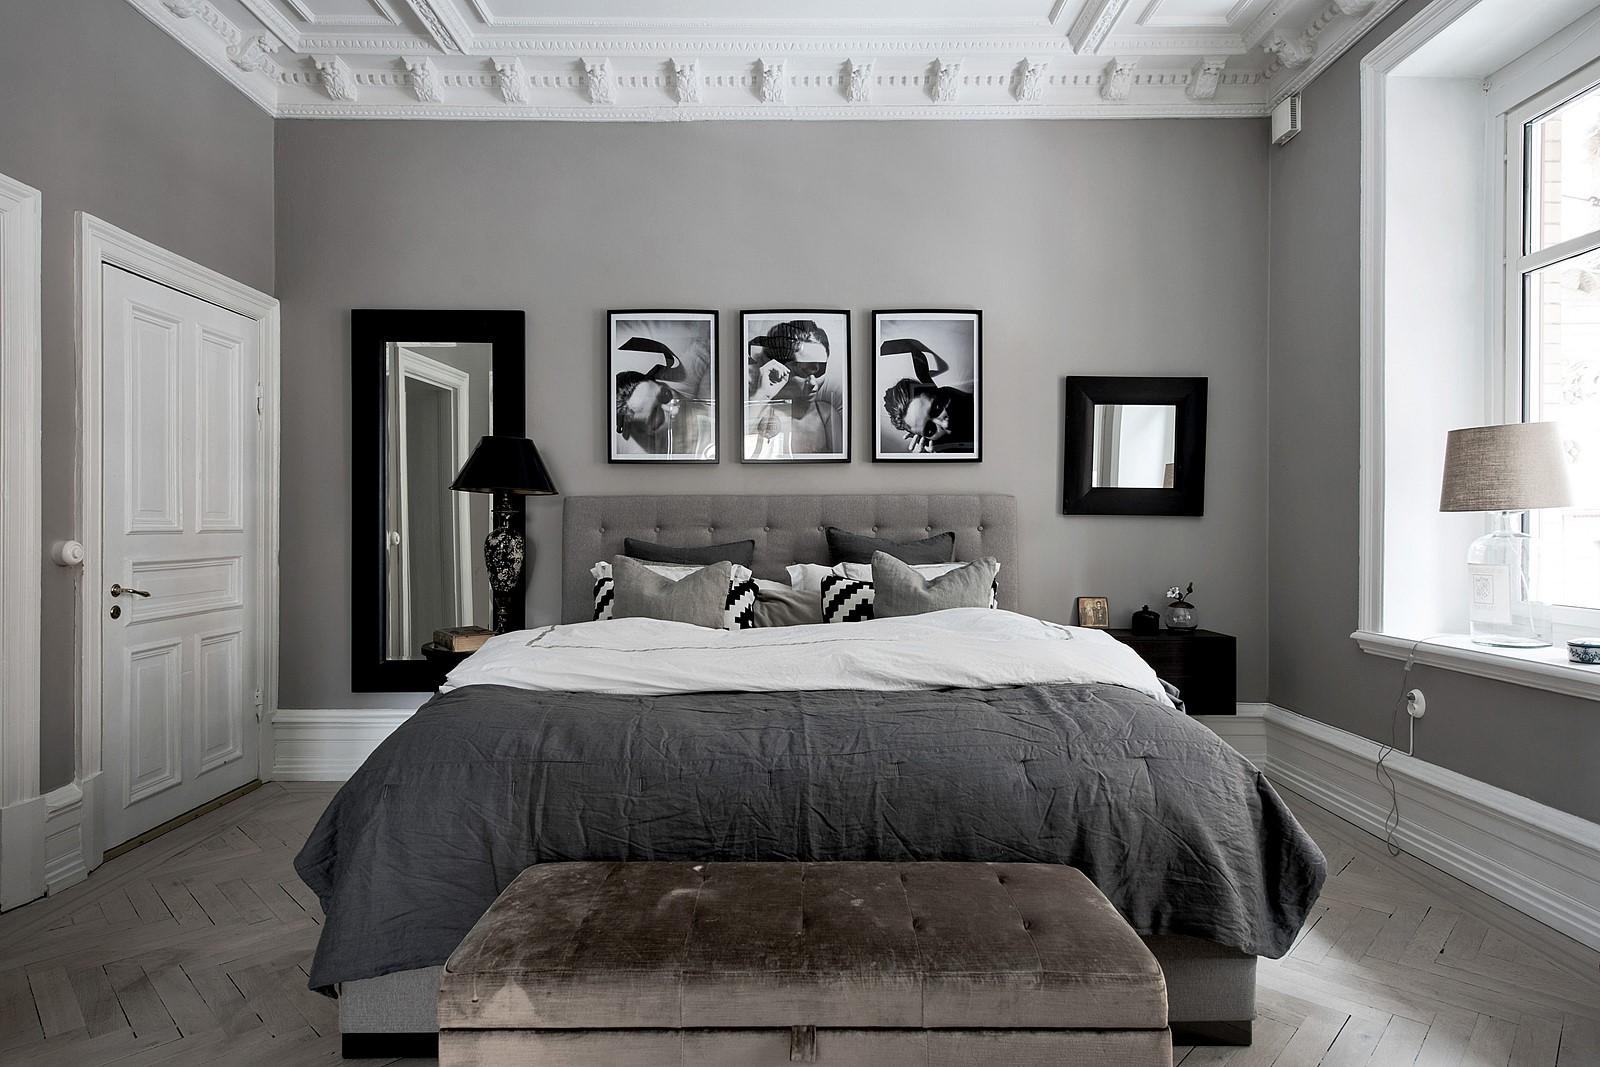 спальня потолок лепнина кровать плинтус